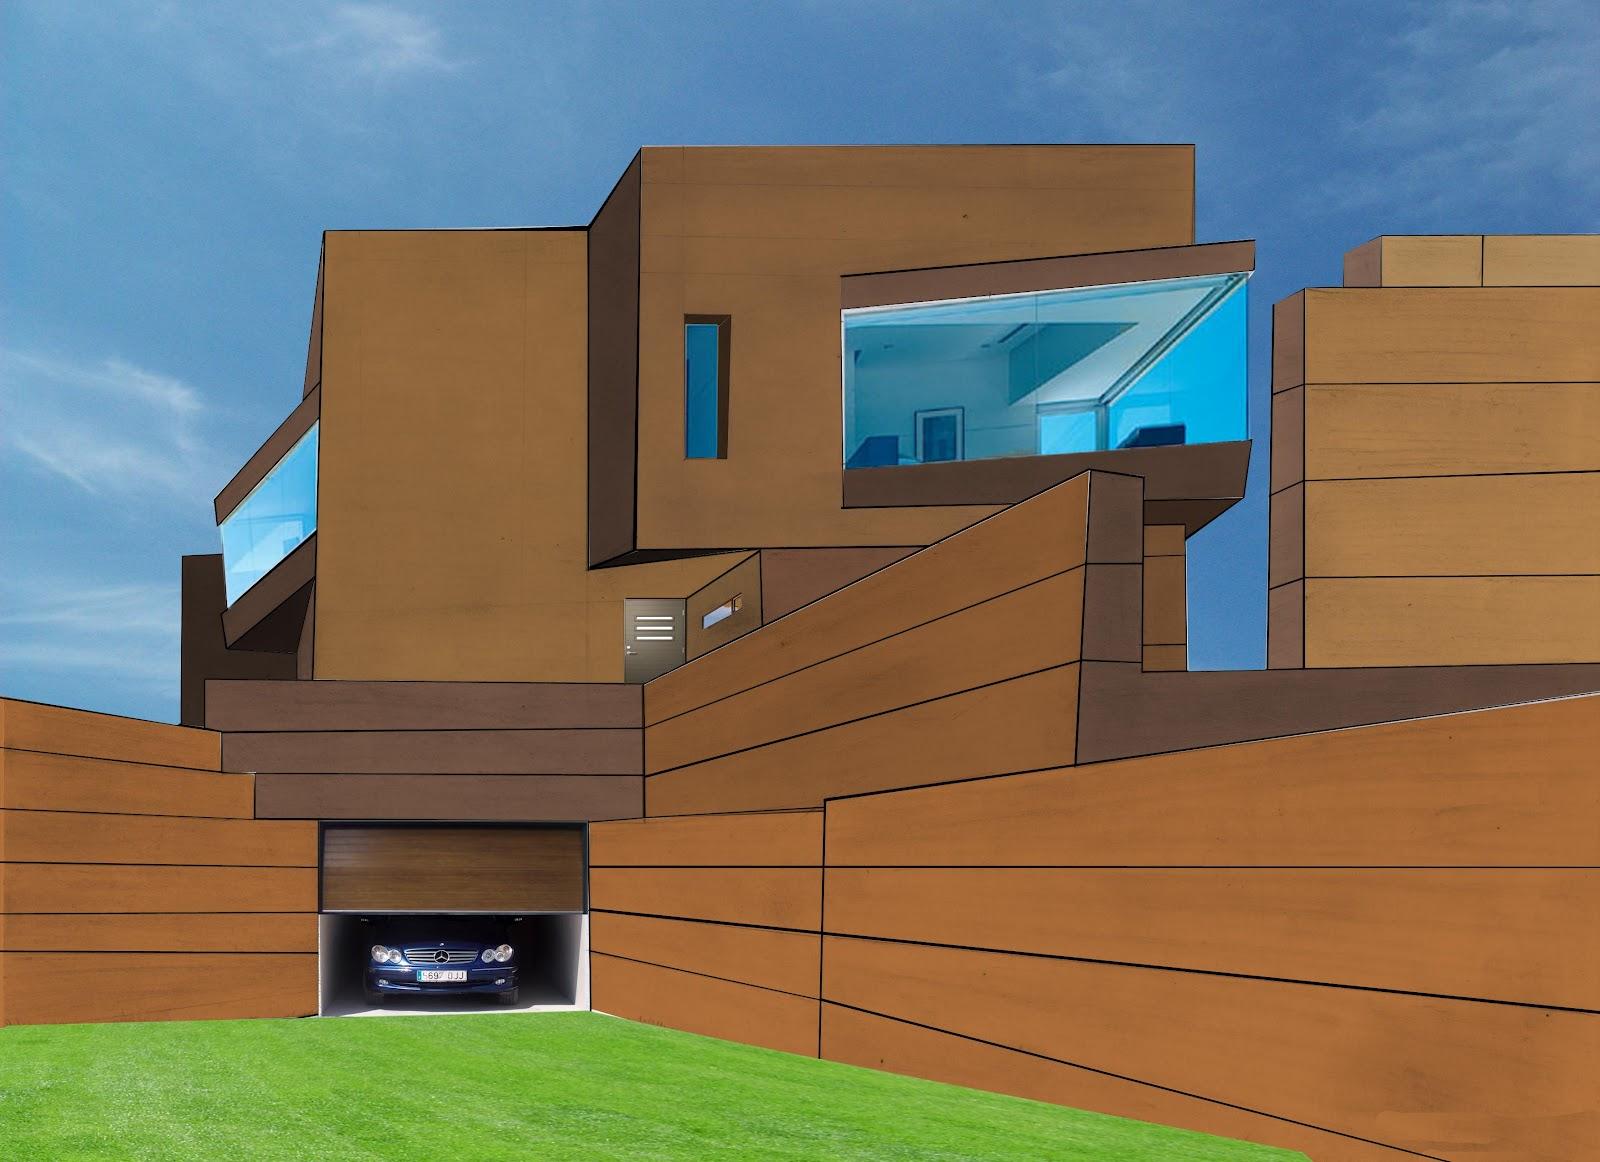 Dibujo y dise o digital casa modular - Casa modular diseno ...